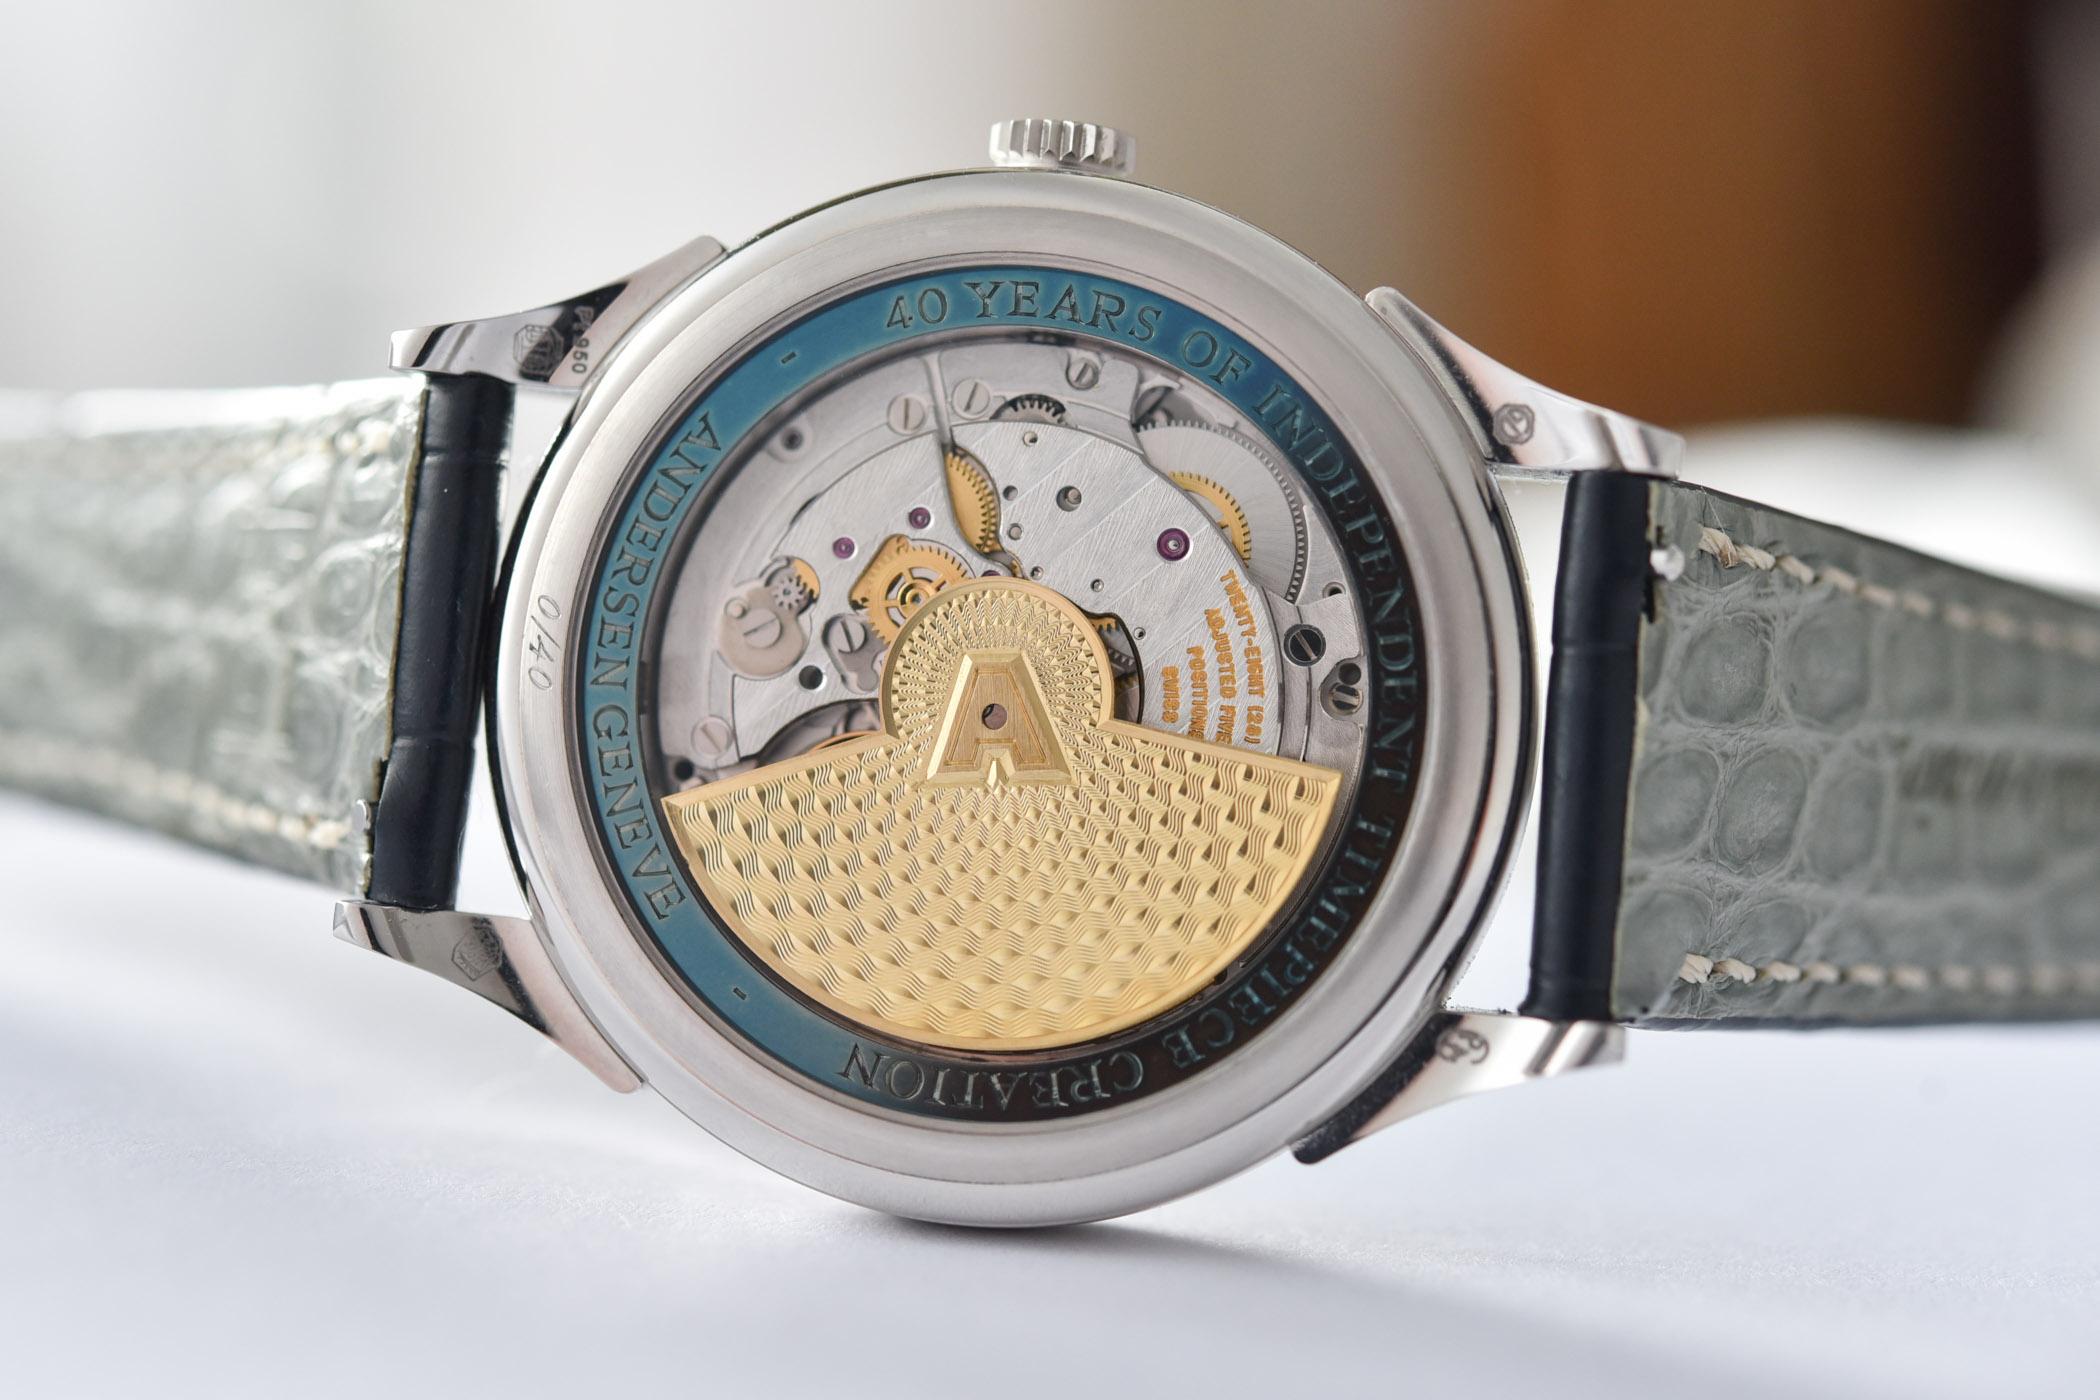 Svend Andersen Geneve 40th anniversary - Jumping Hour Watch - 6